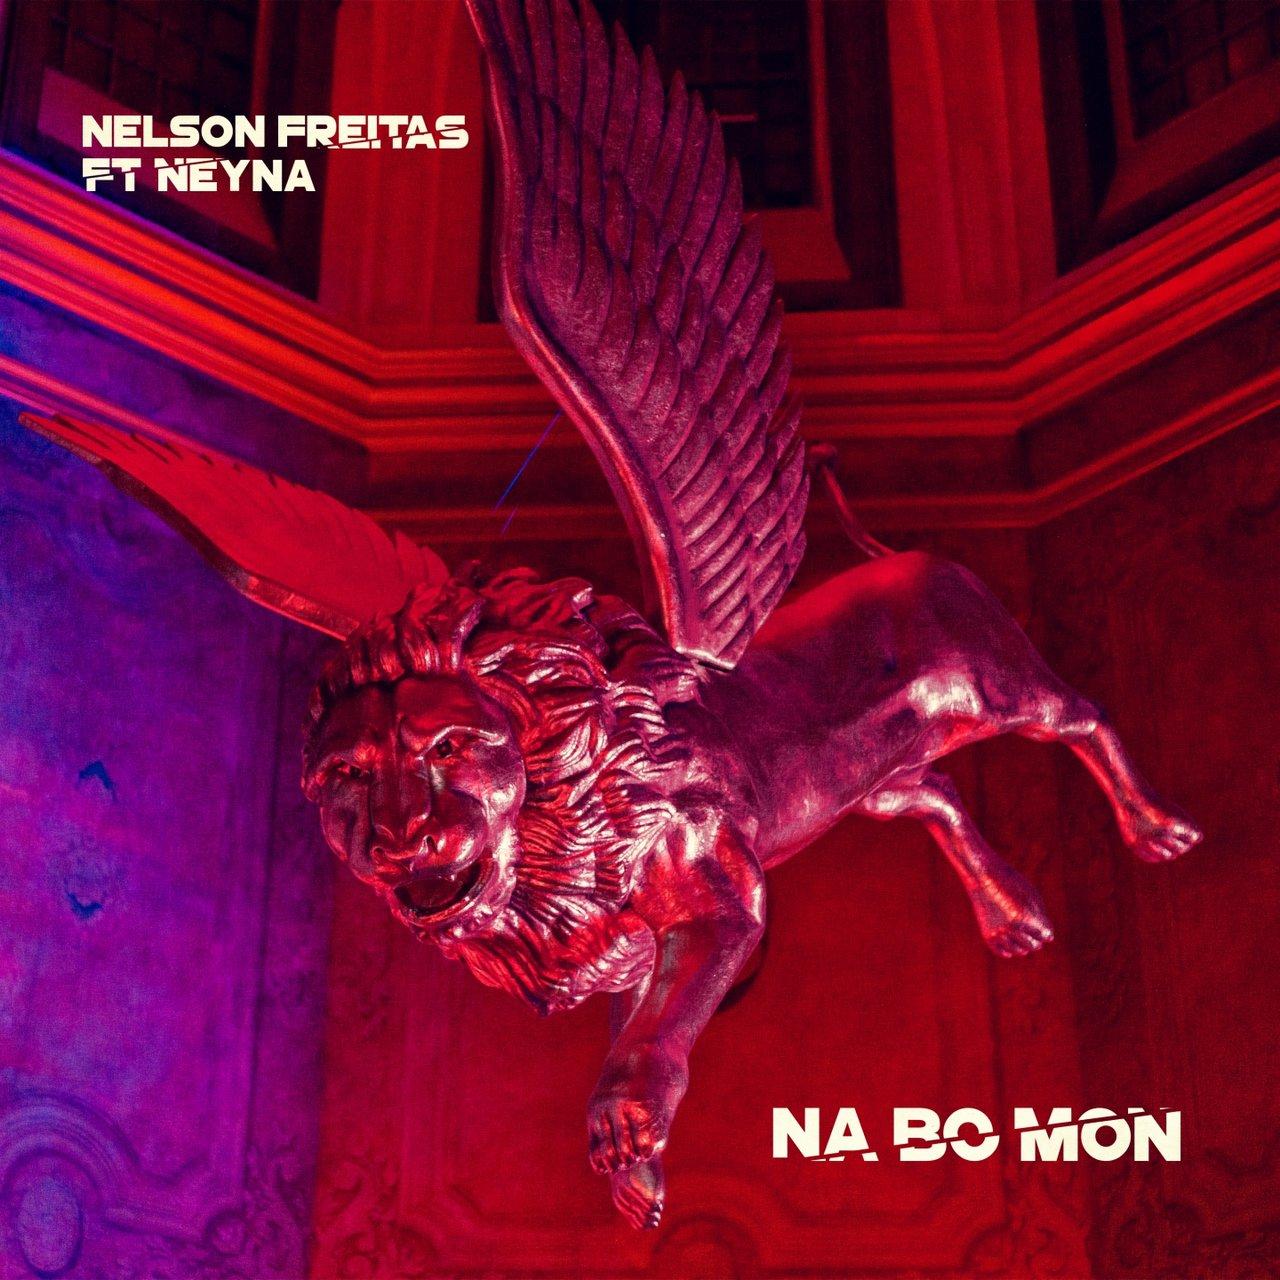 Nelson Freitas - Na Bo Mon (ft. Neyna) (Cover)